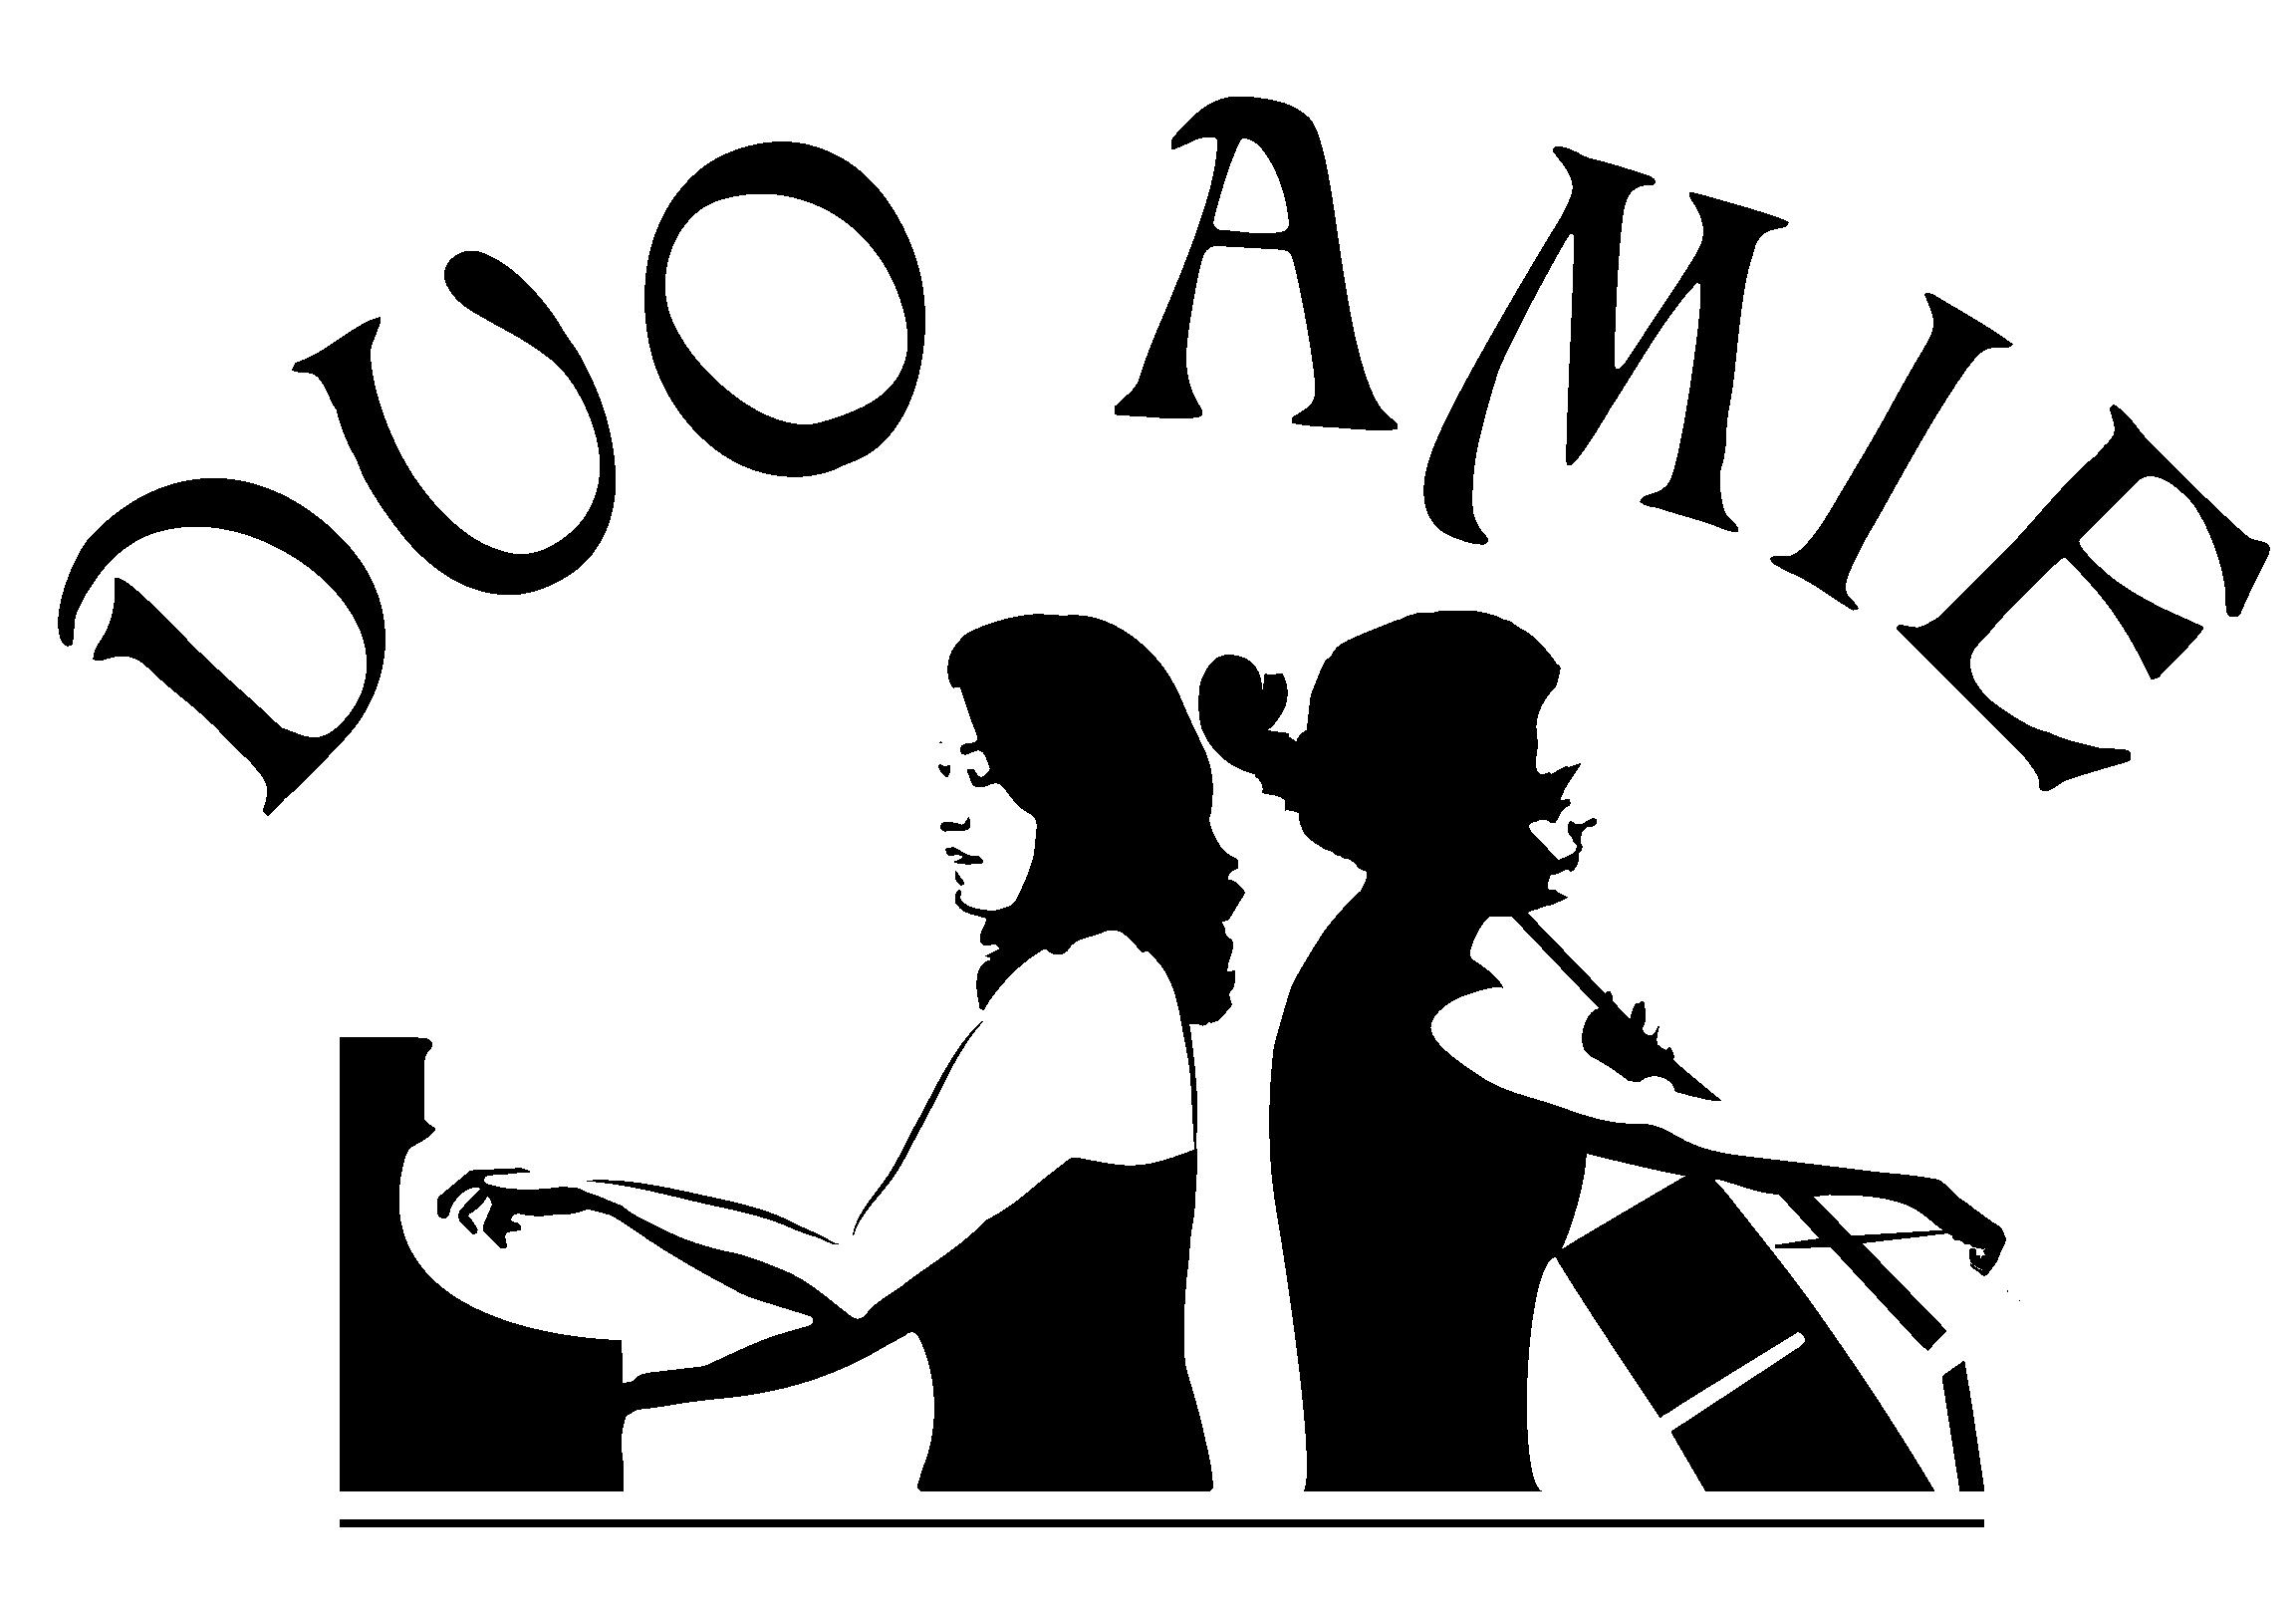 Duo Amie